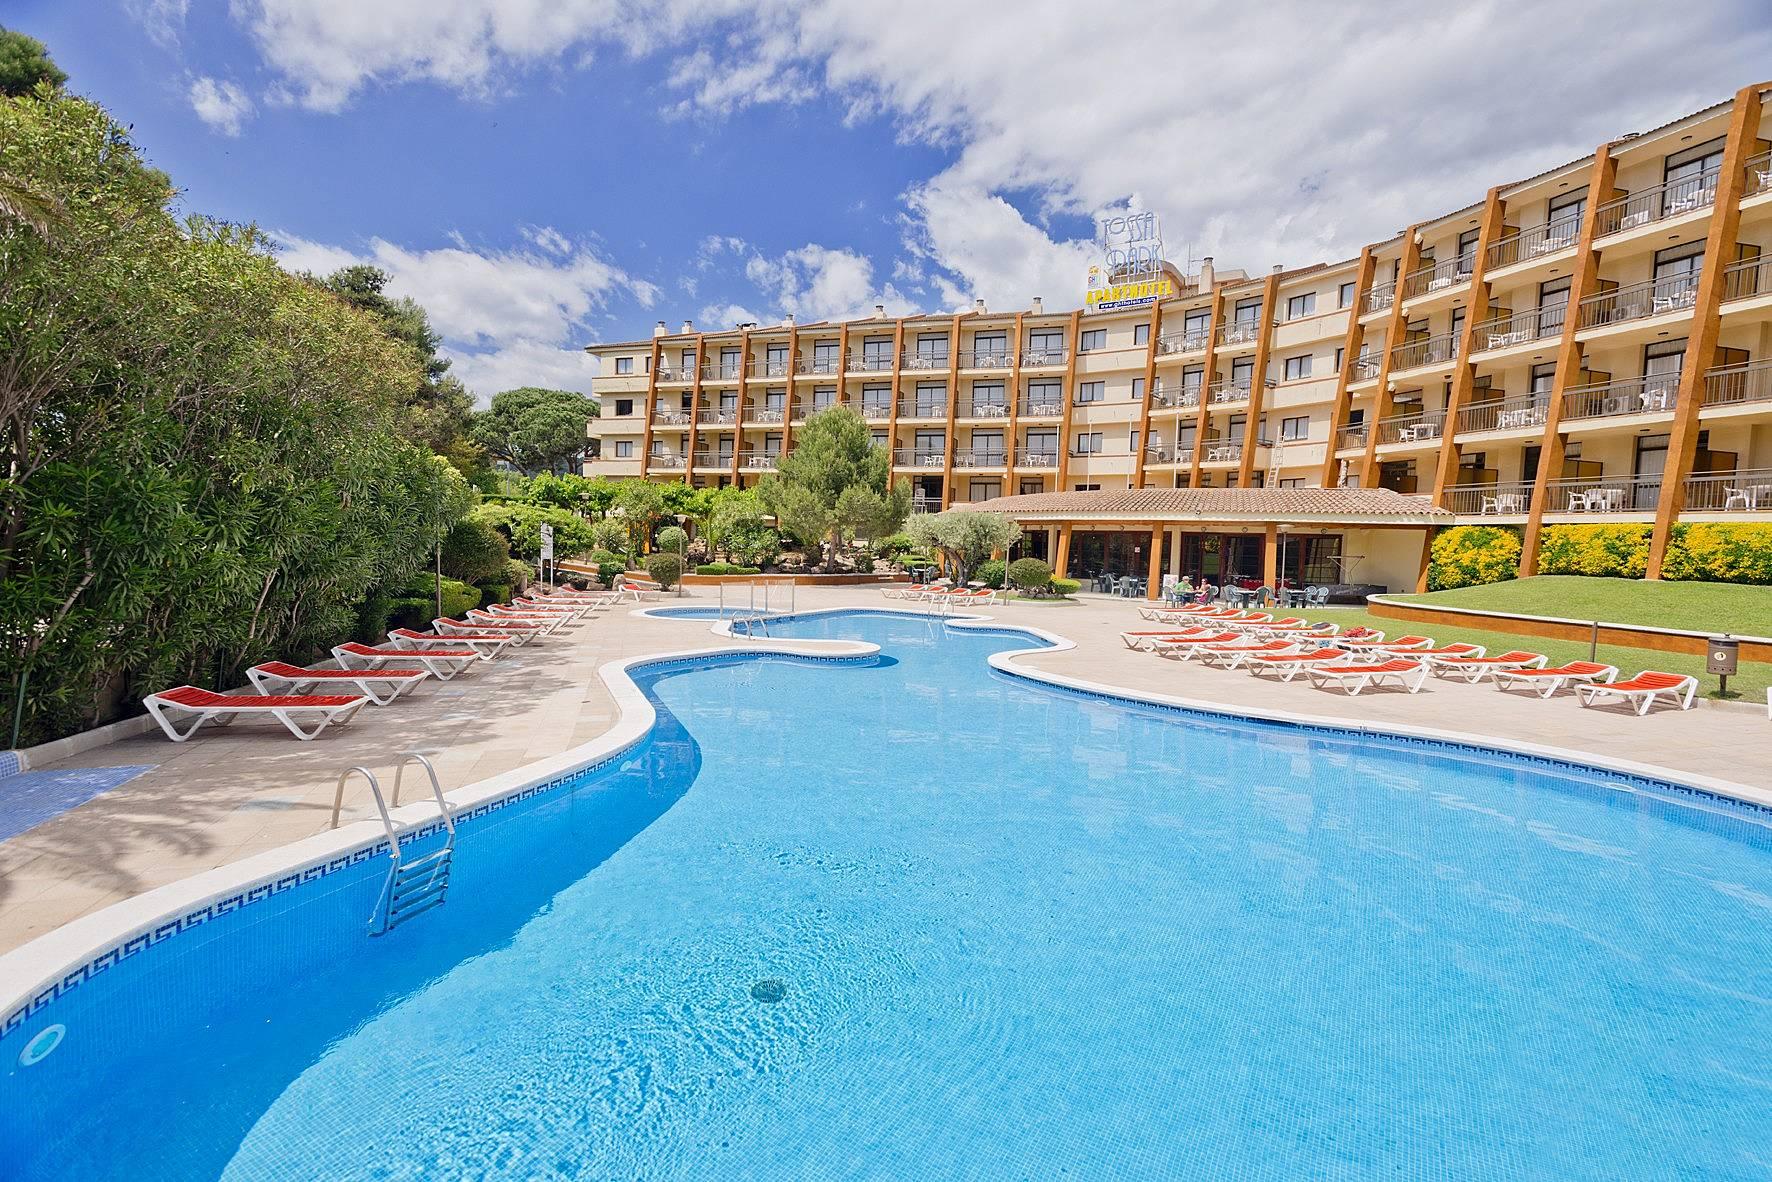 6 Modern Apartments With Pool Near Beach Tossa De Mar Girona Costa Brava